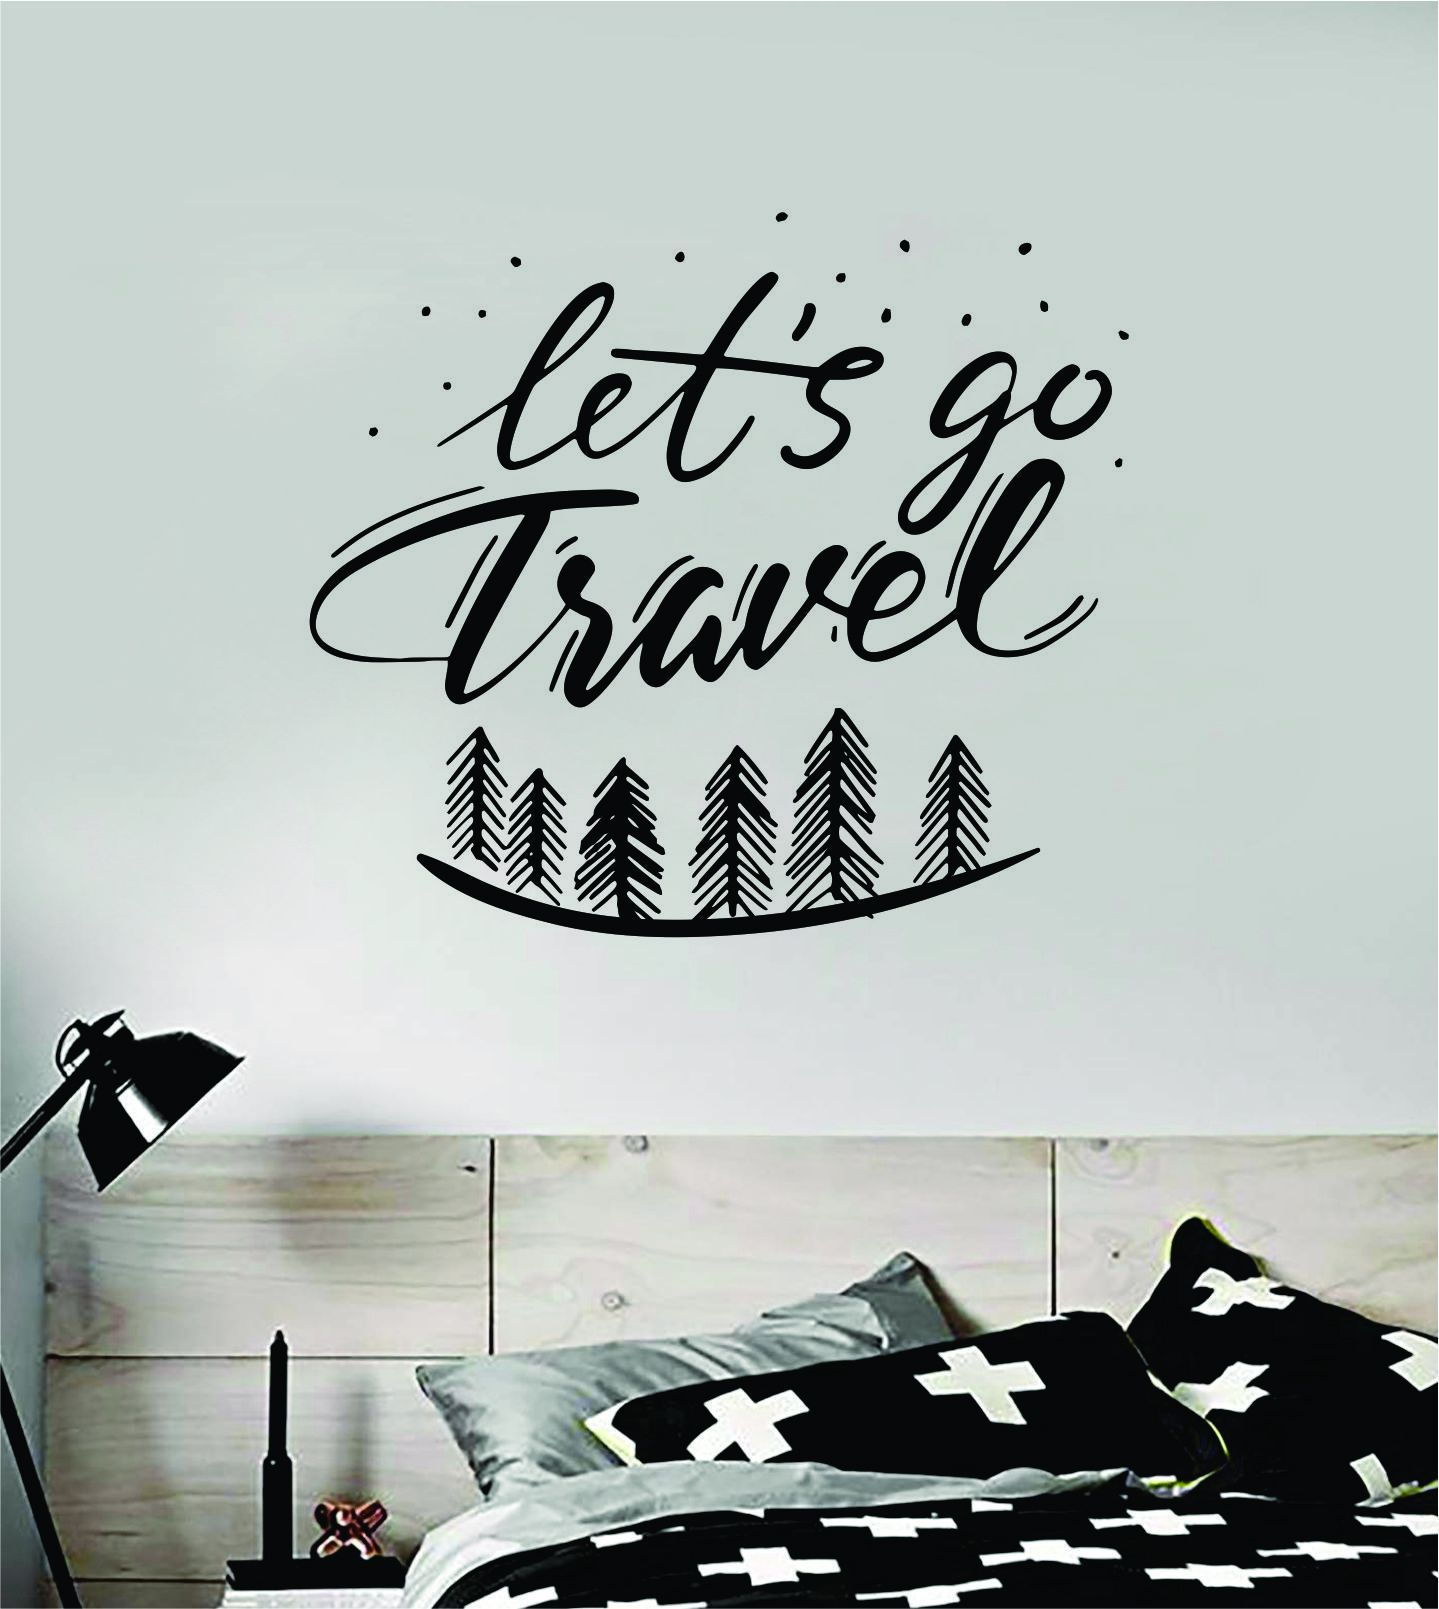 Let's Go Travel V2 Wall Decal Sticker Bedroom Room Art Vinyl Beautiful Inspirational Adventure Mountains Wanderlust Explore Teen Kids Baby Nursery Trees - grey